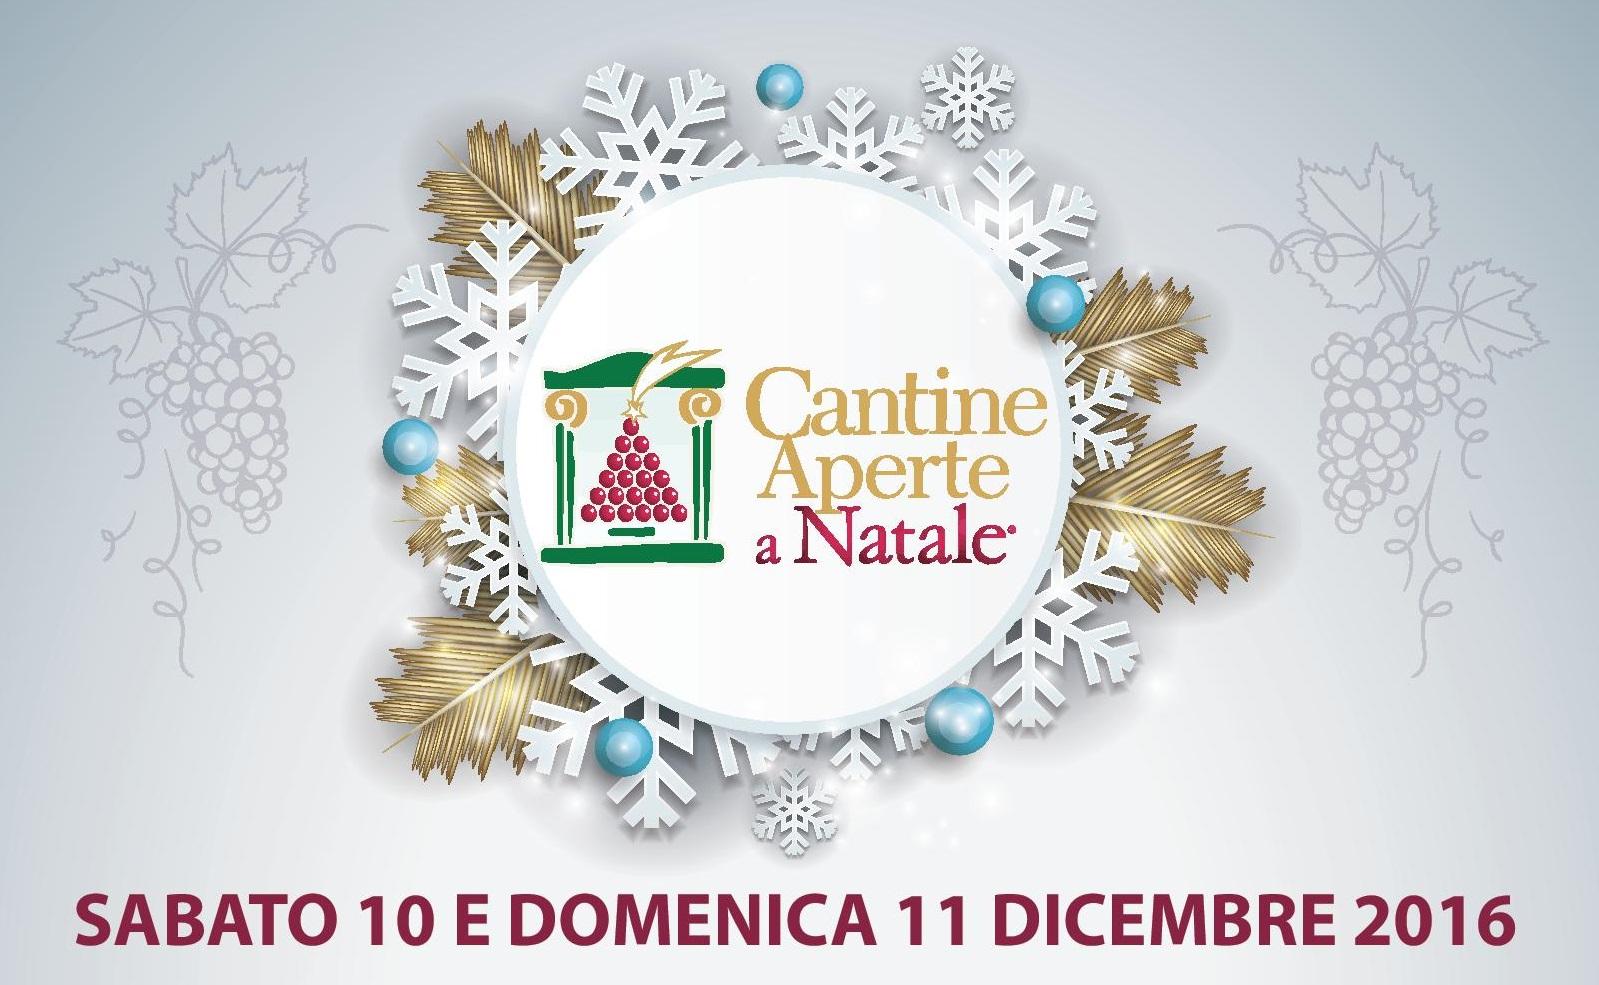 Pagina Cantine Aperte Natale-page-001 ITA